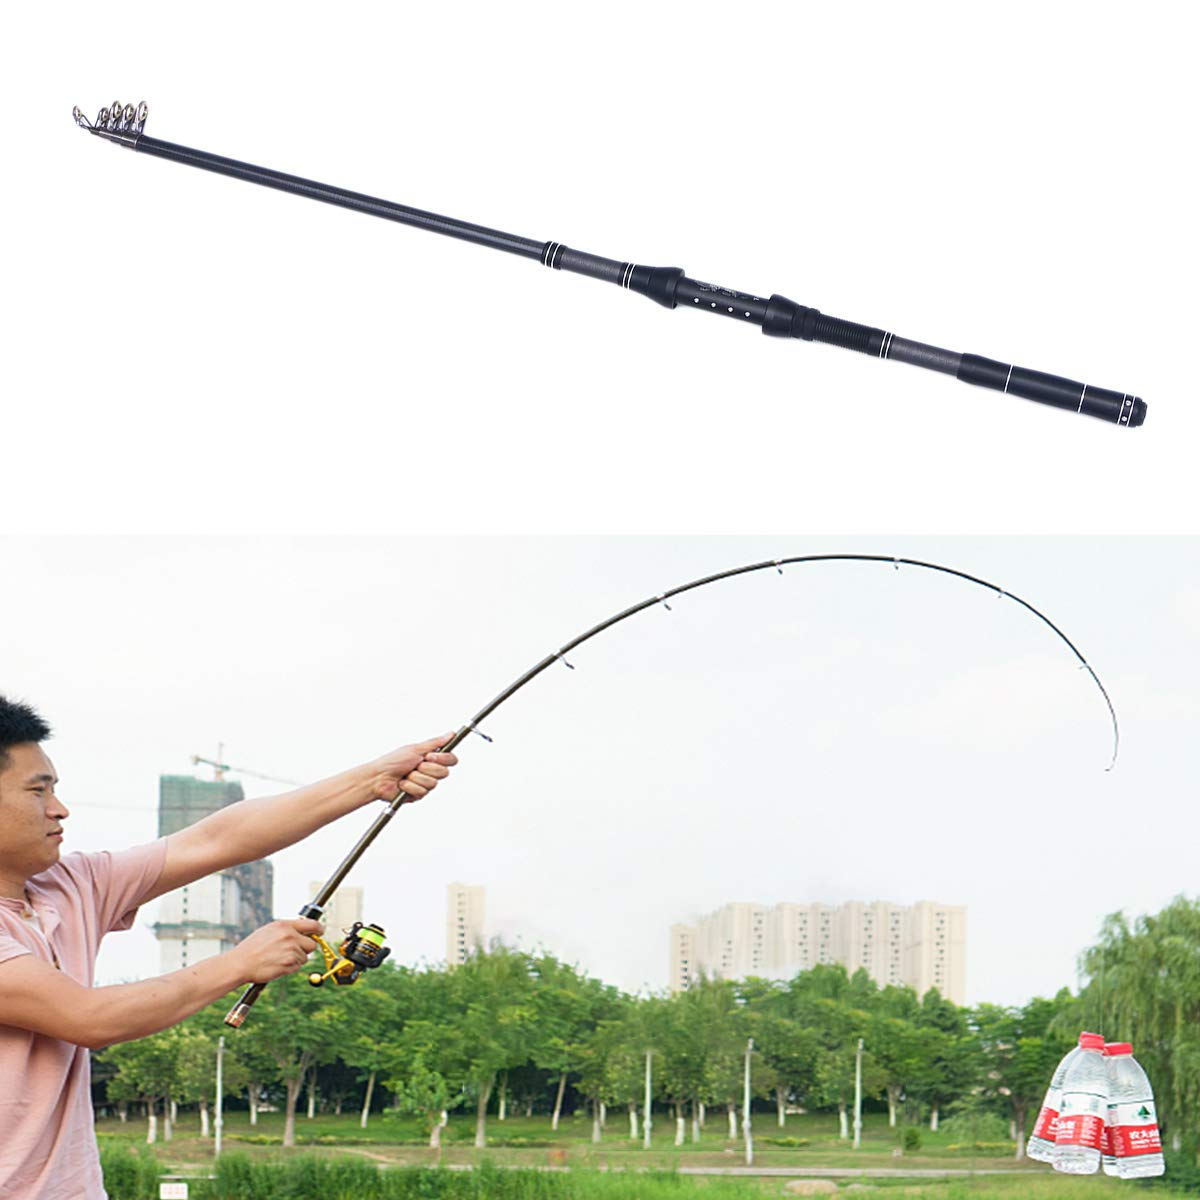 LIOOBO 2.1 Metros Universal Spinning Rod Fibra de Carbono Ca/ña de Pescar Pesca Telesc/ópica Marching Fishing Rod Ultrashort Fishing Tackle